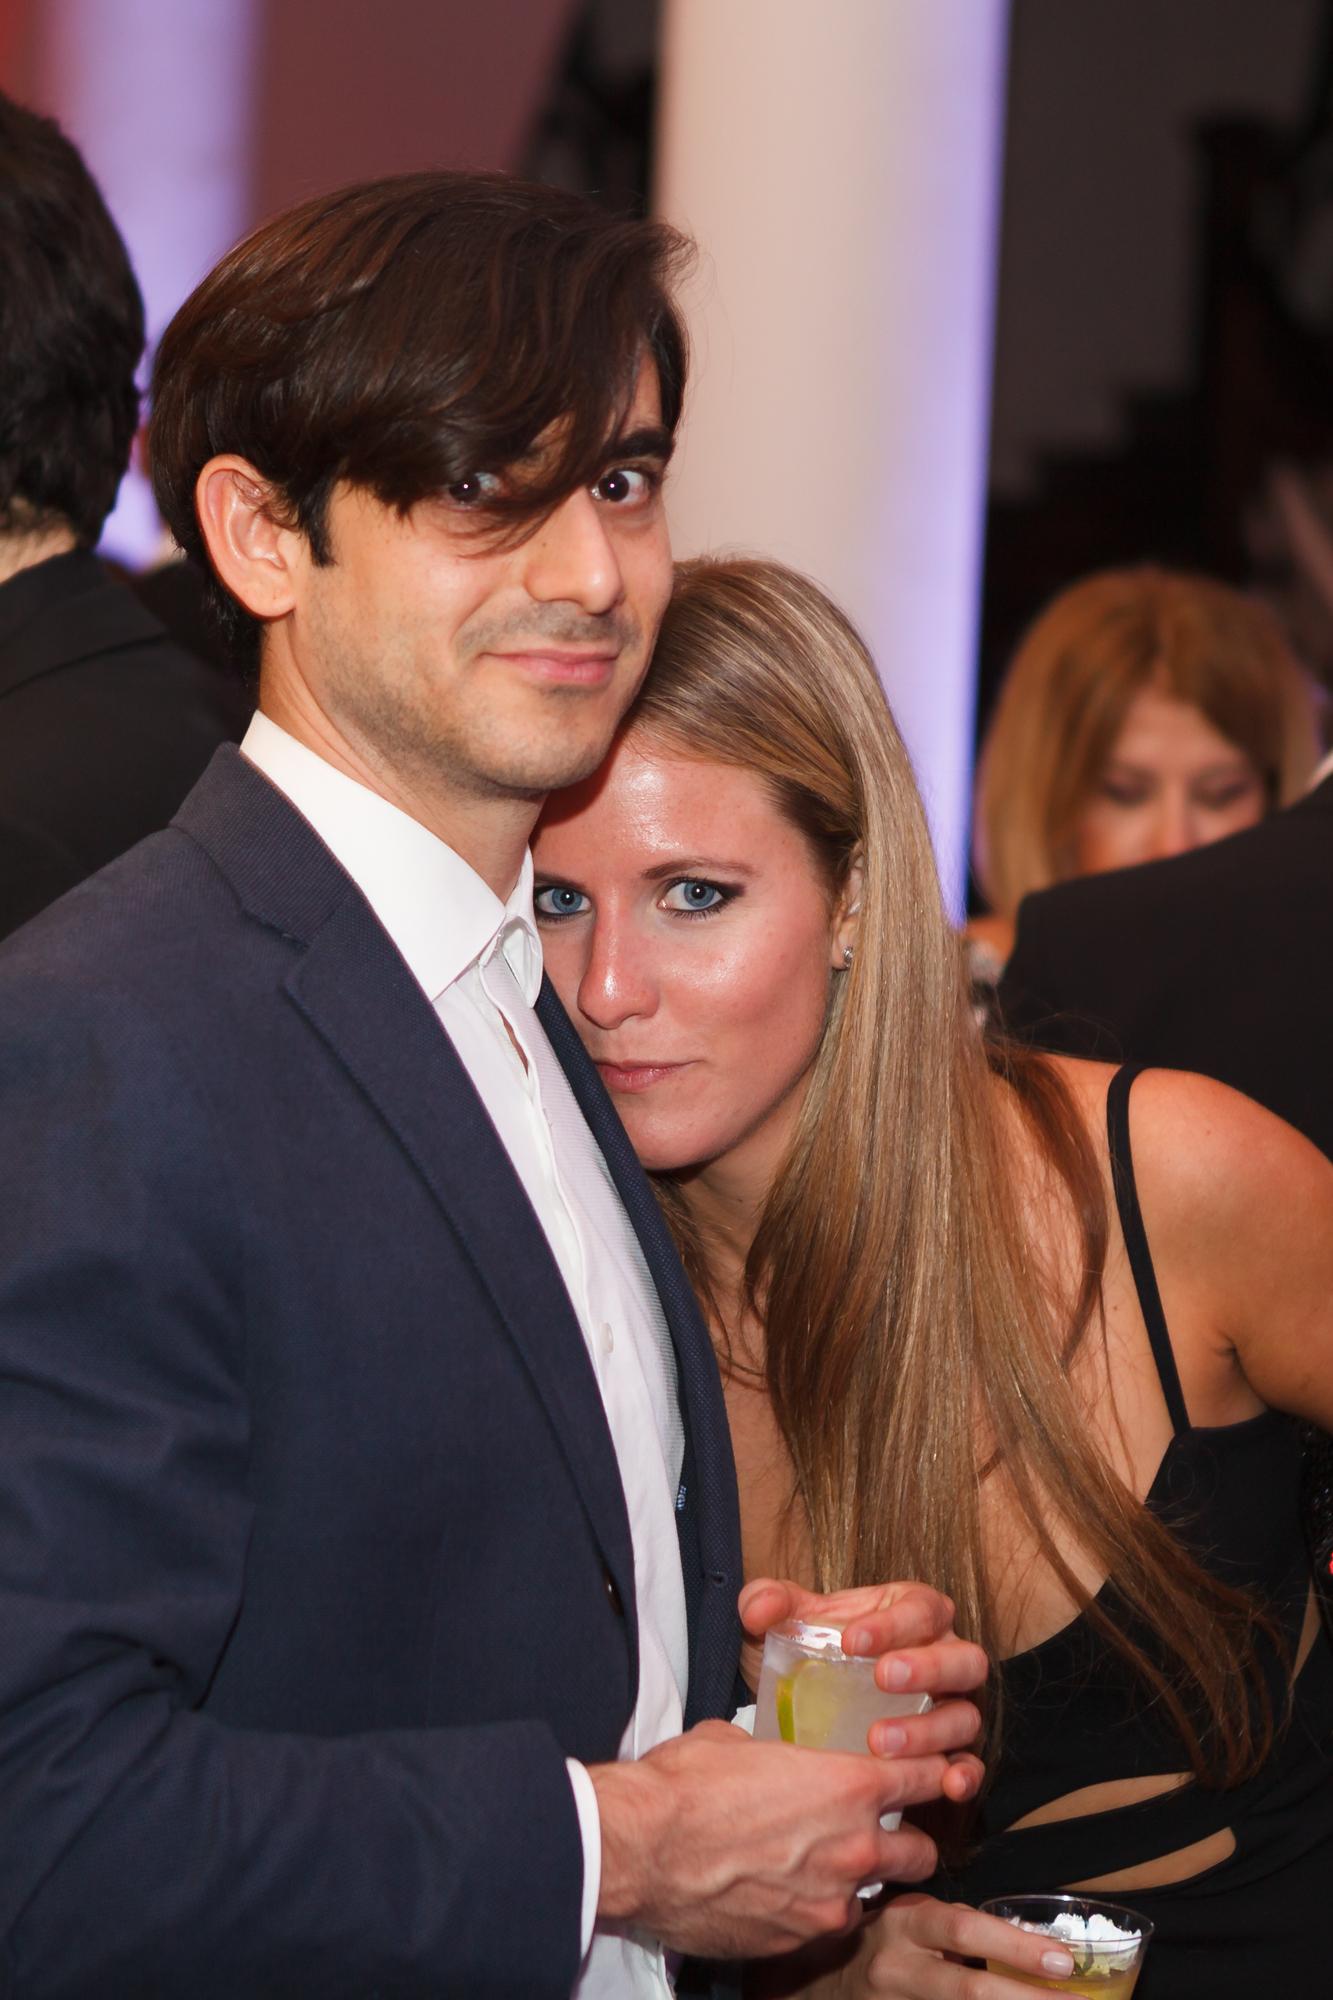 AlexTphoto.com - Team Nat Foundation-55.jpg